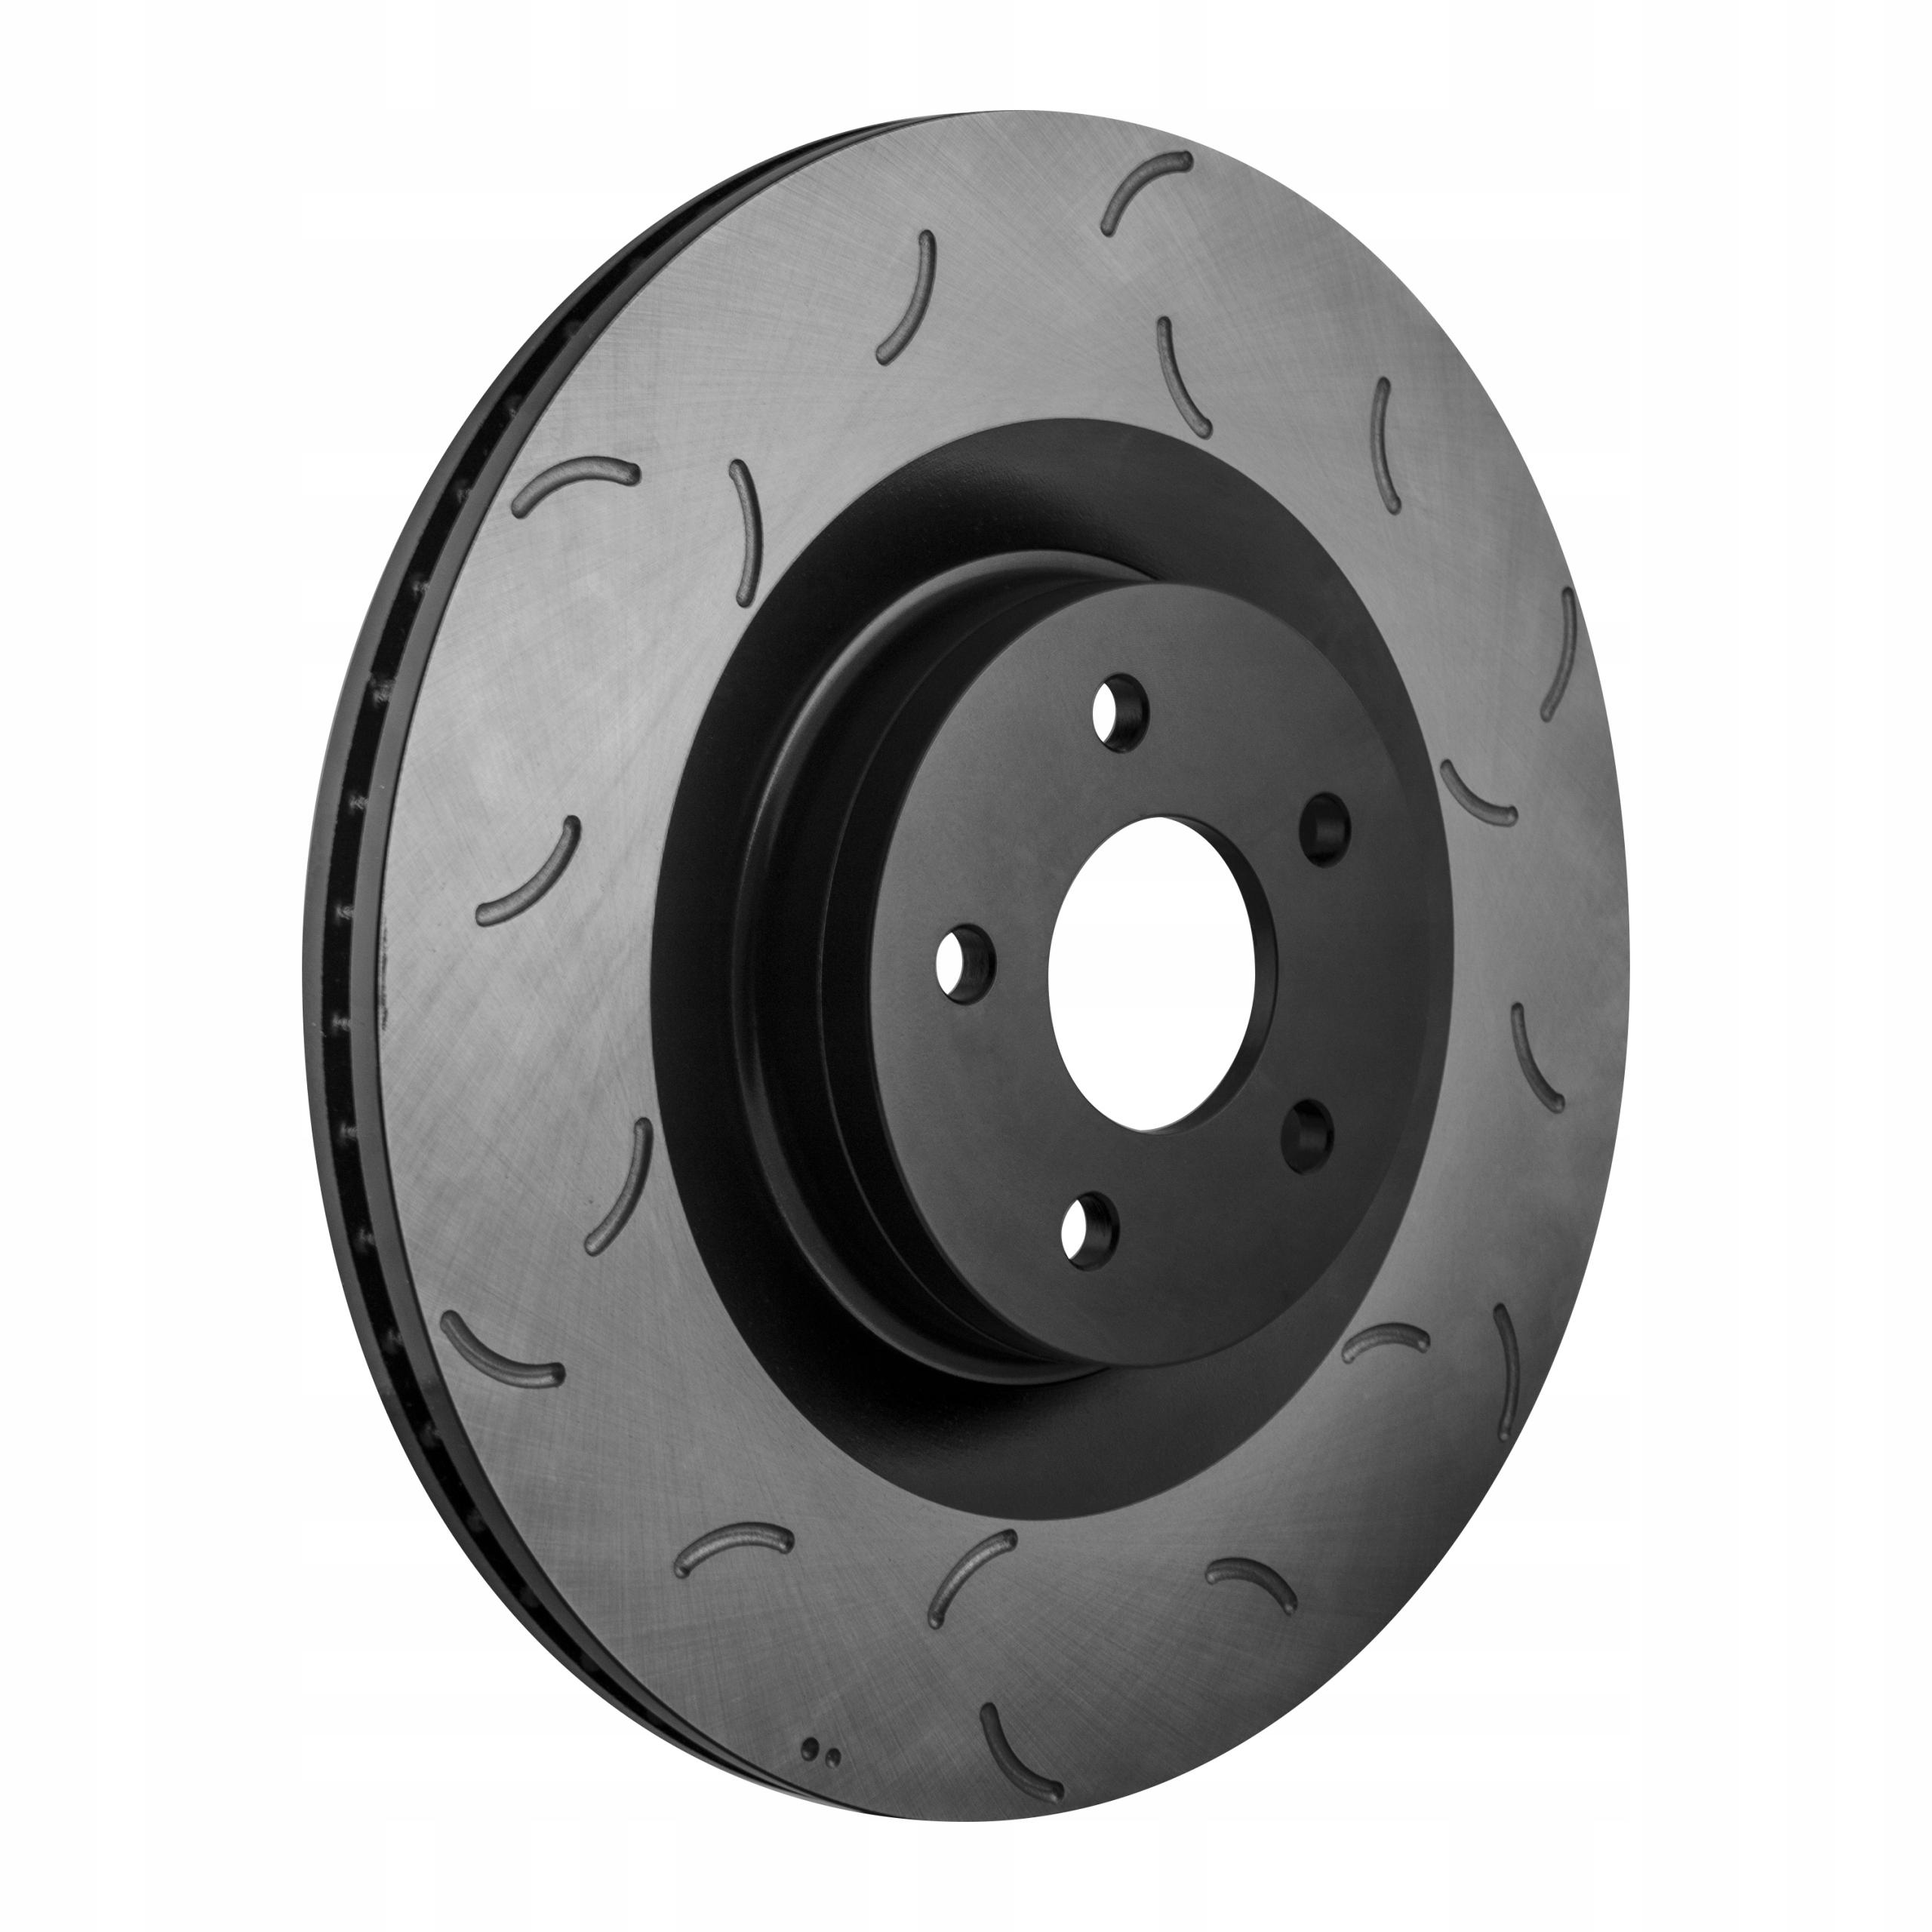 диски dark ultra вперед lexus ls460 ls600h 358mm